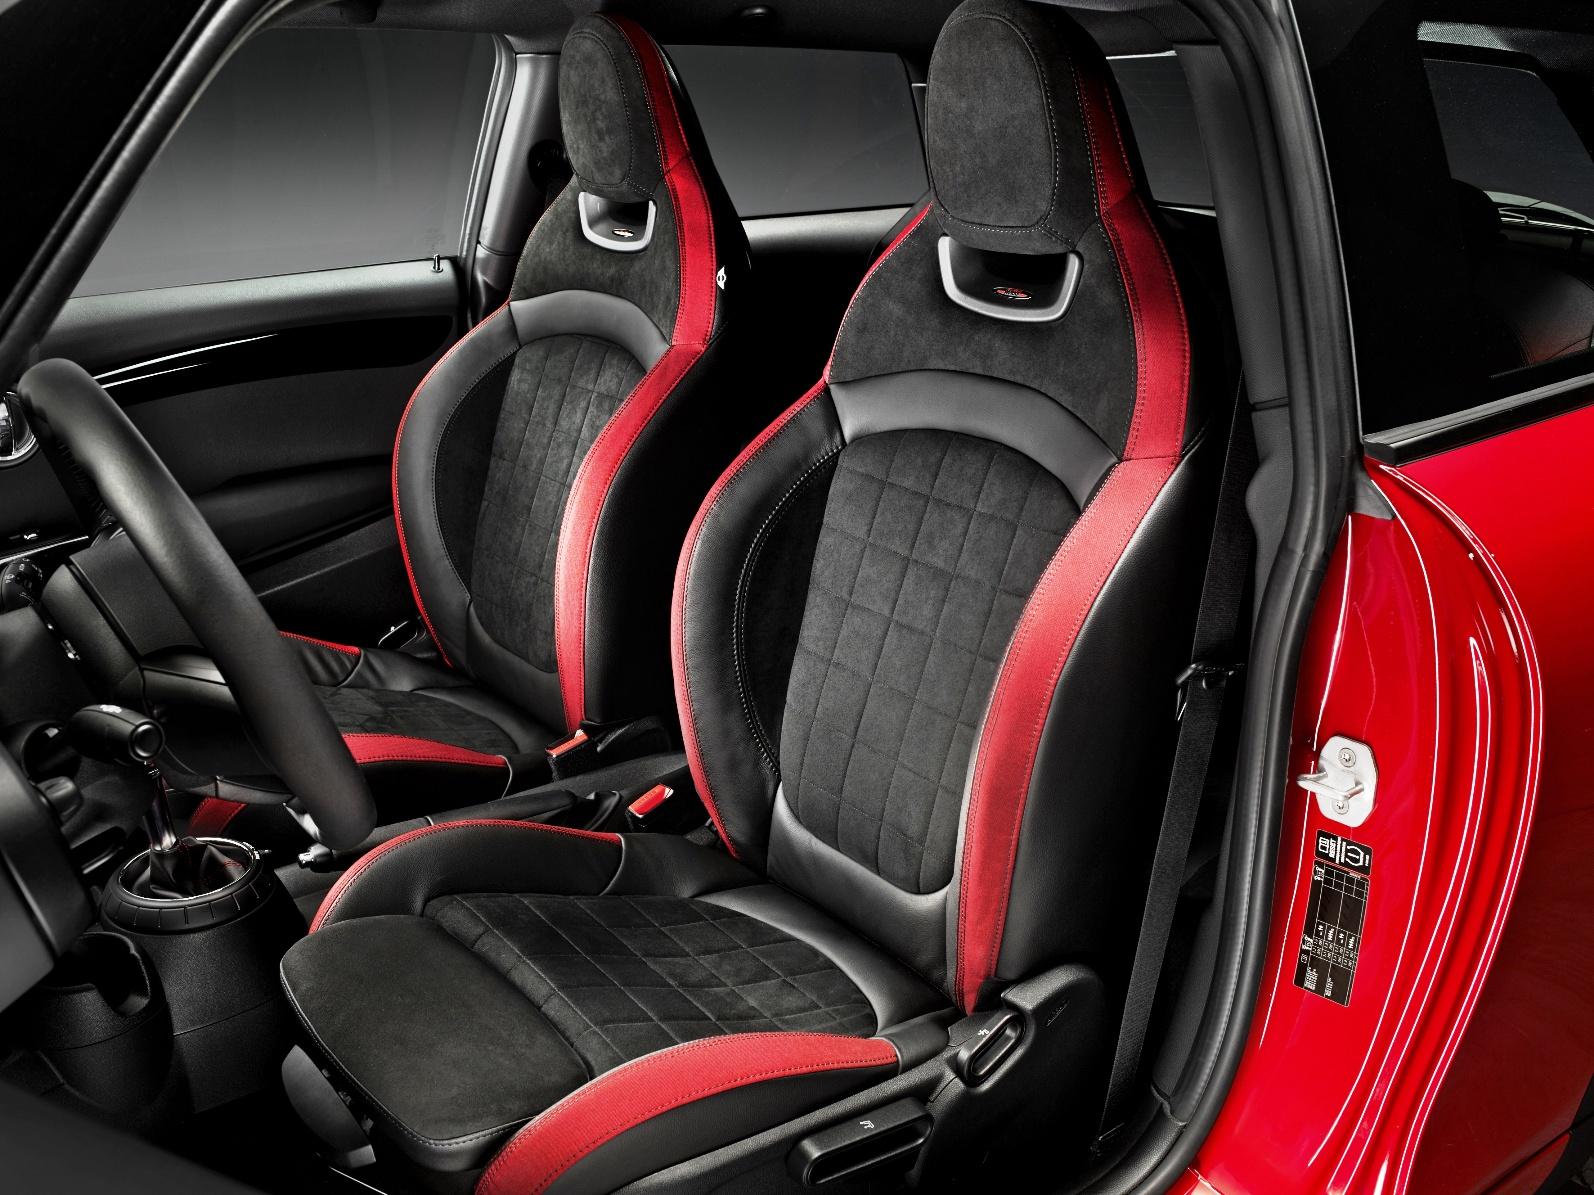 MINI Hatch JCW front interior